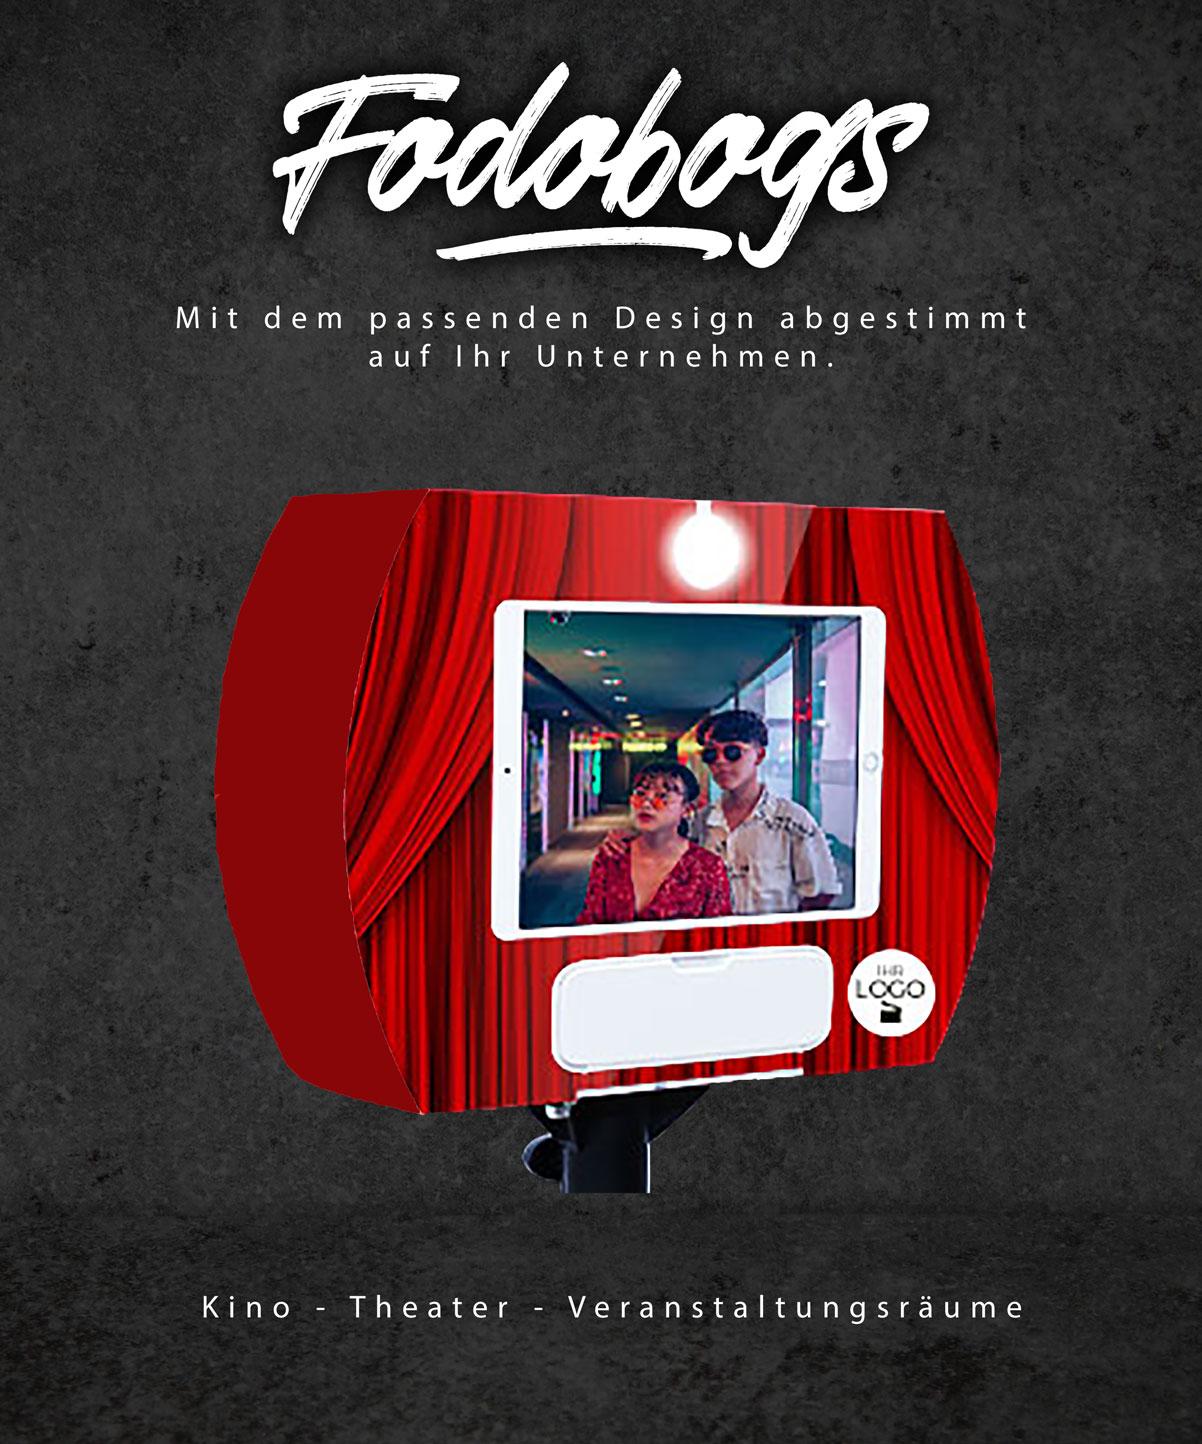 Fotobox Kino Theater